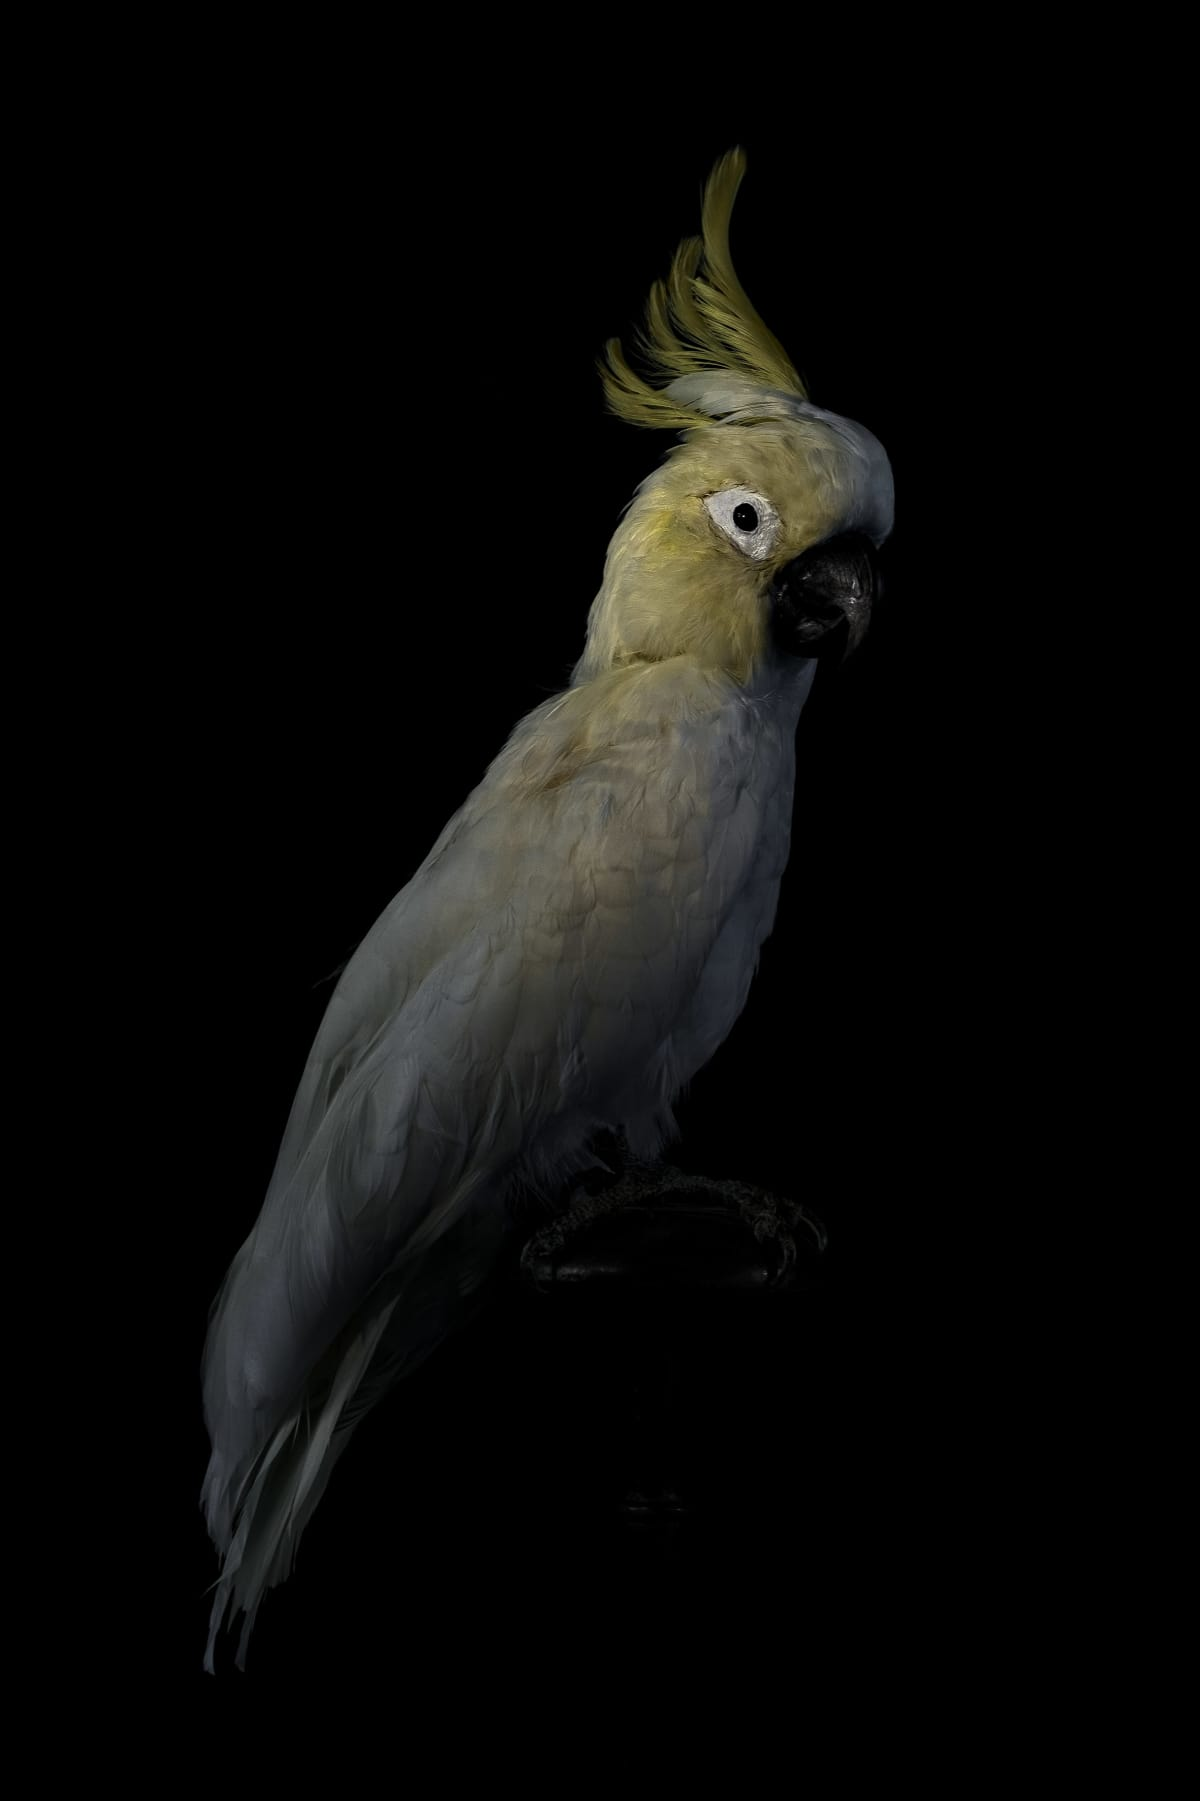 Lucas Lenci, Oiseau 35, 2015 - 2019